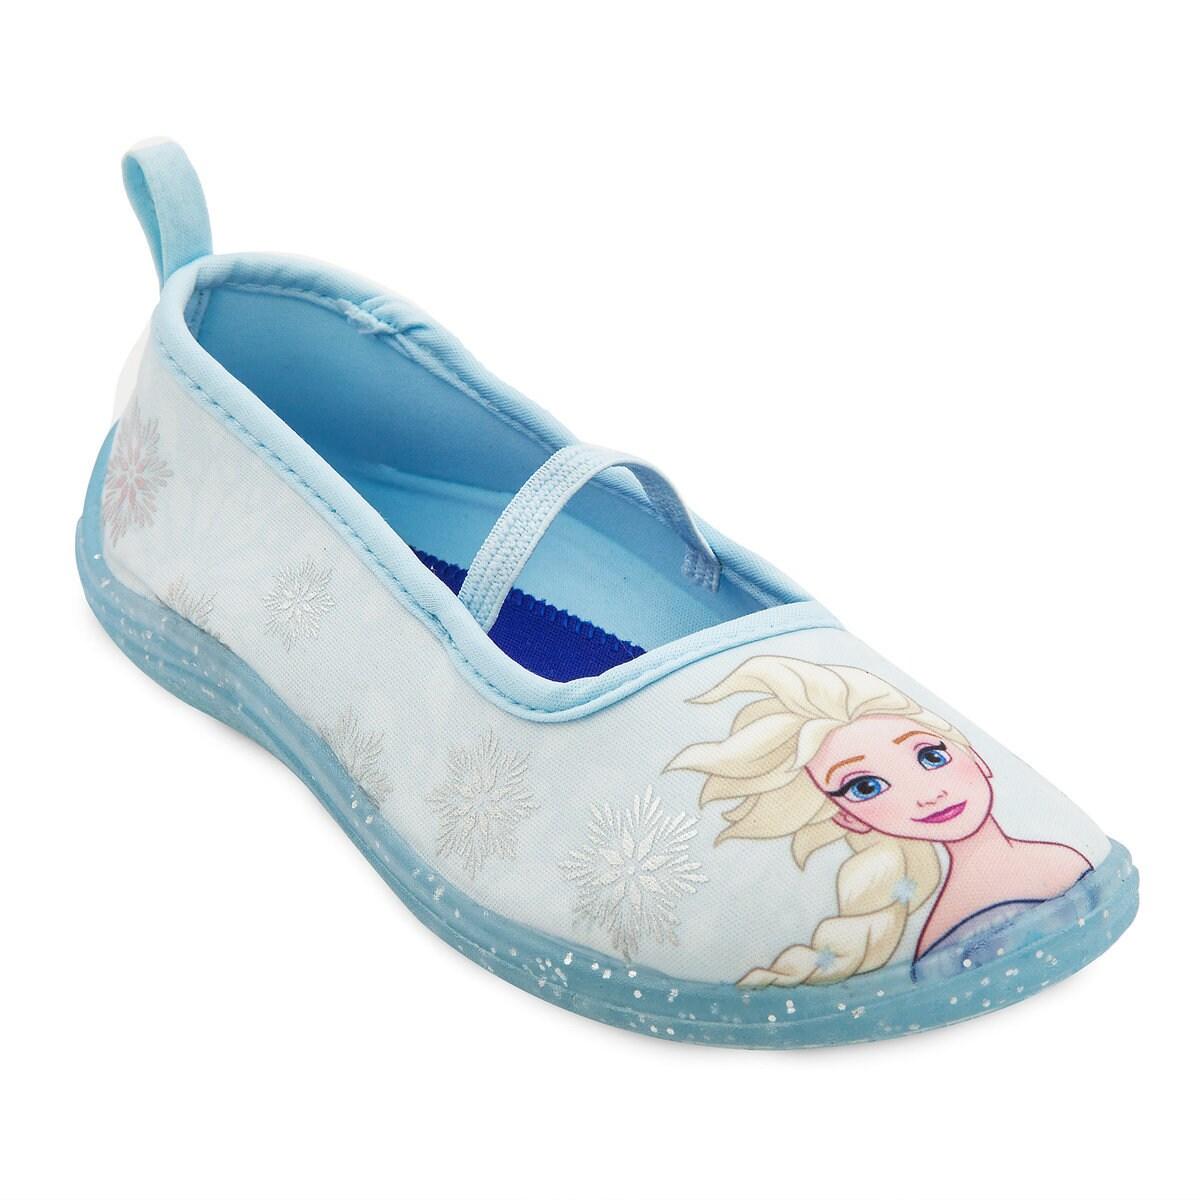 88eda82872 Product Image of Elsa Swim Shoes for Kids - Frozen # 1